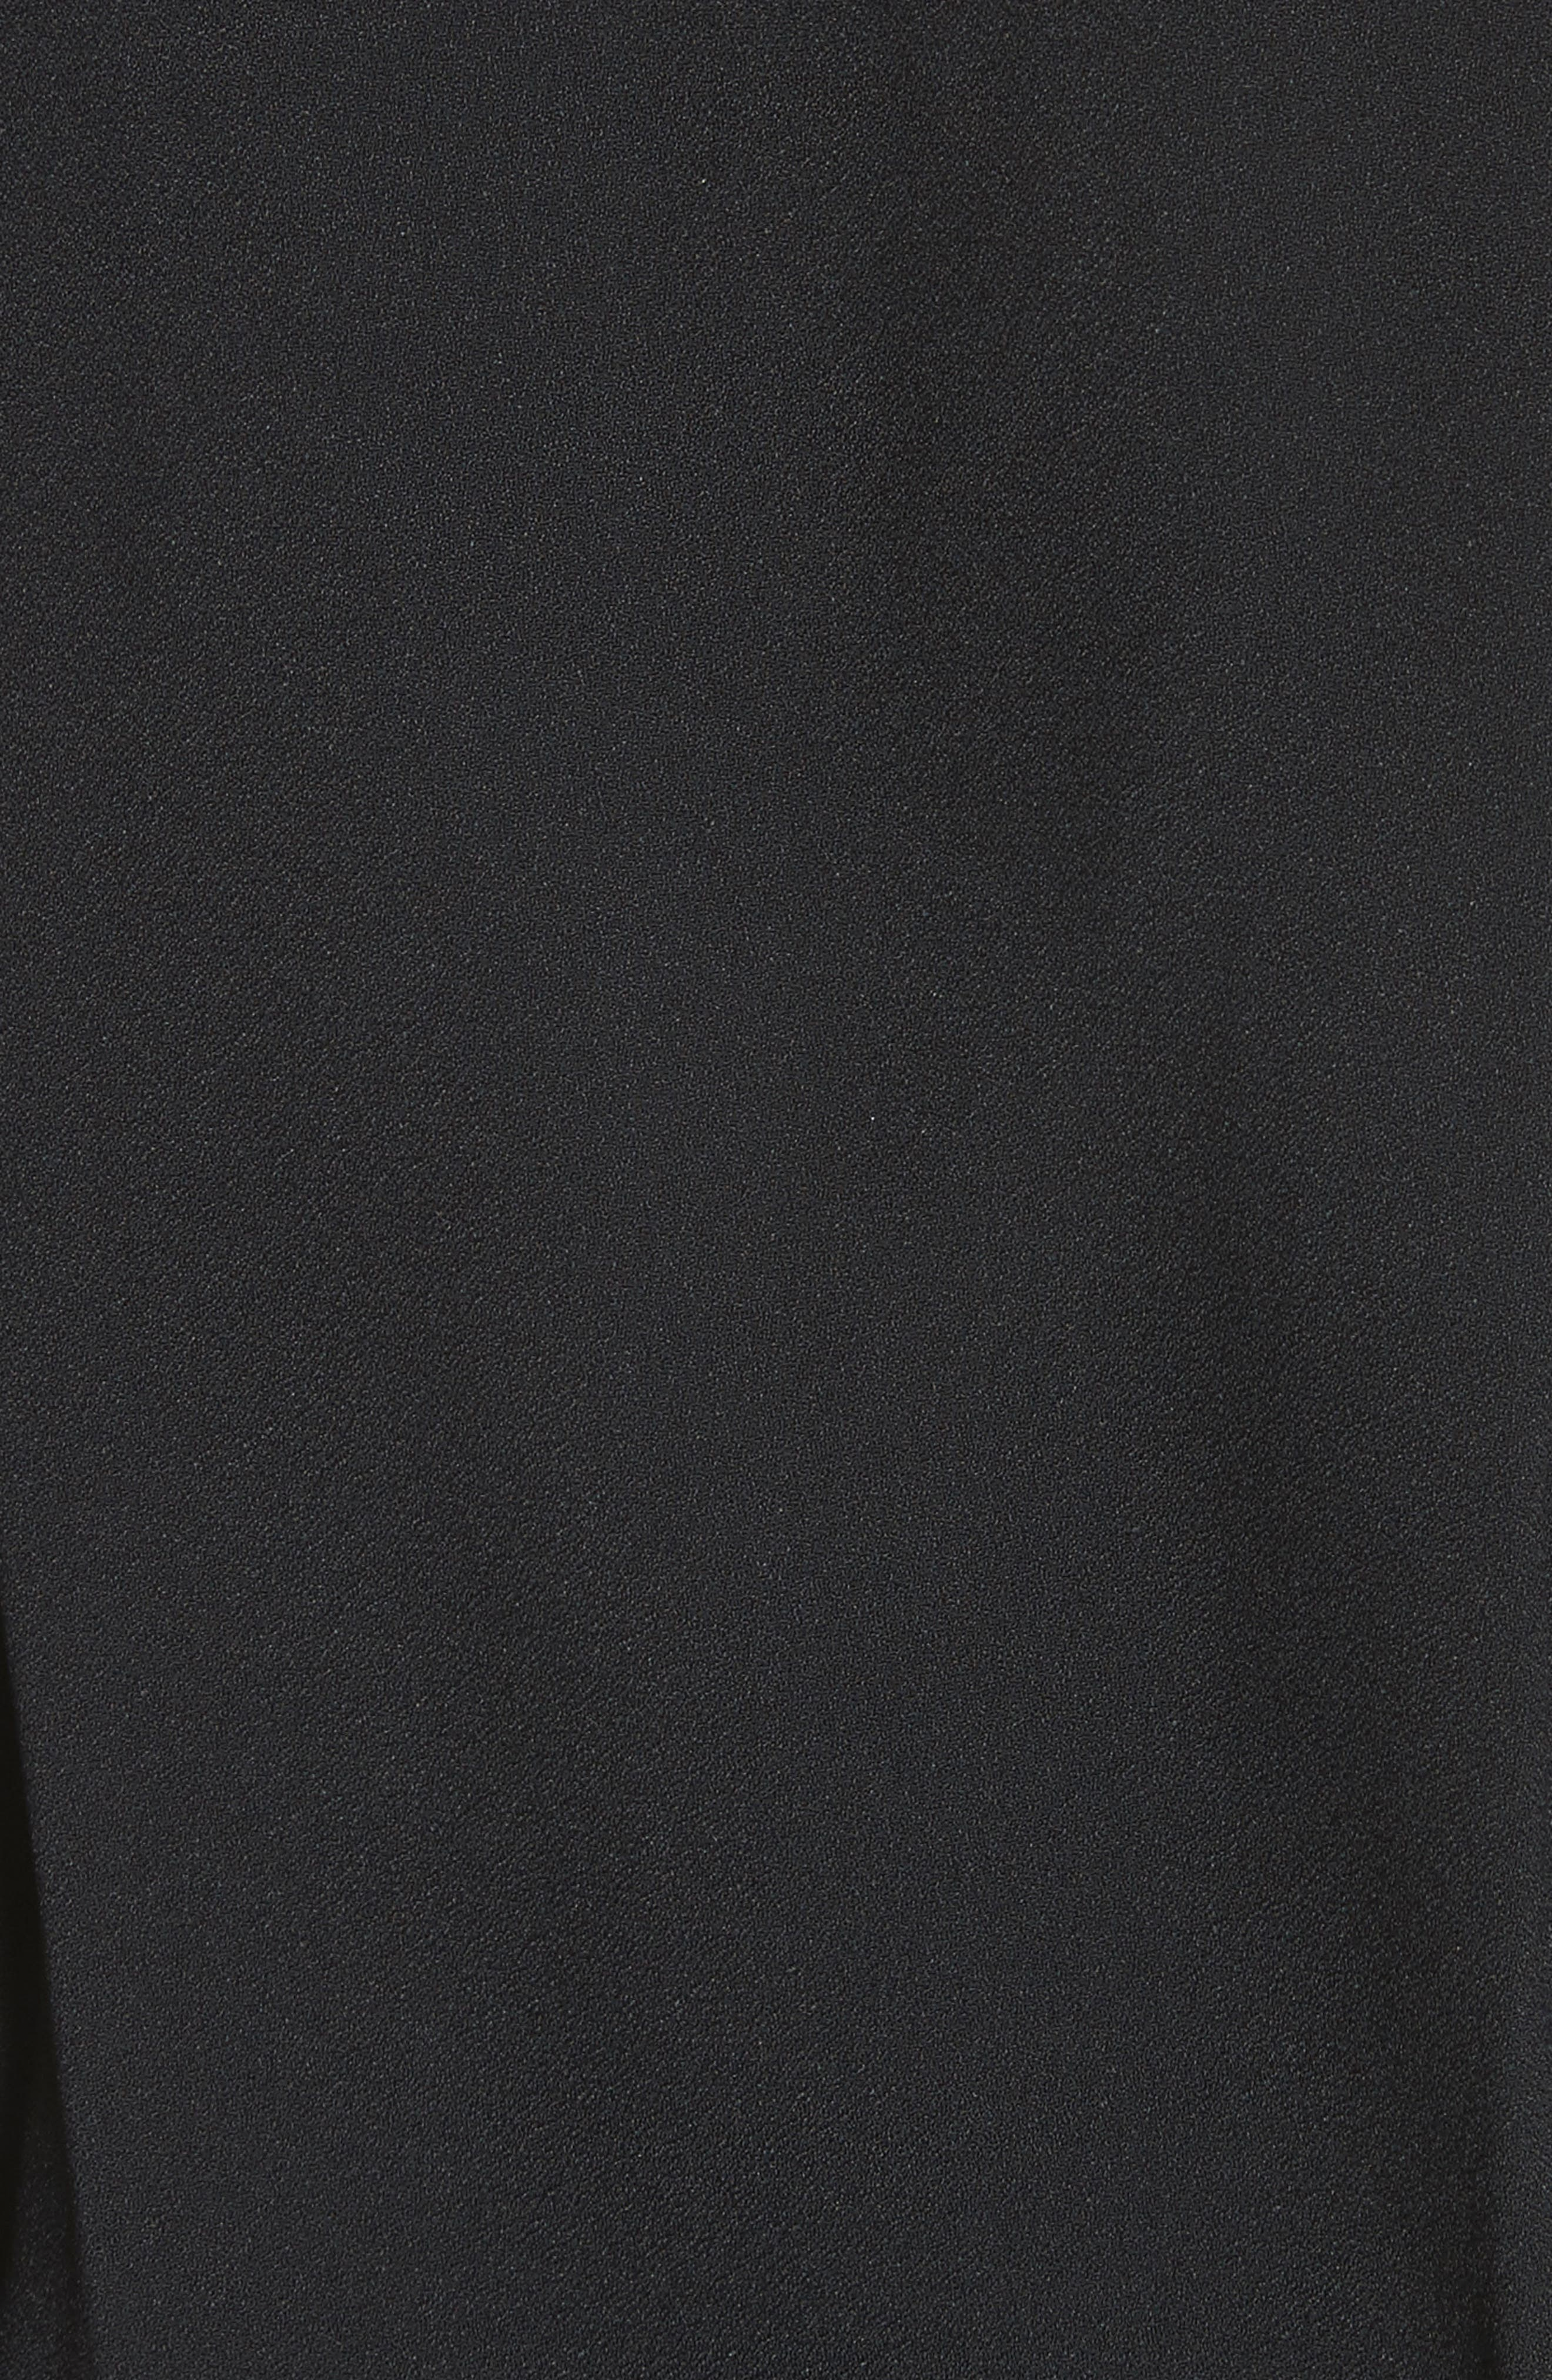 Ruched Blouson Dress,                             Alternate thumbnail 6, color,                             Black